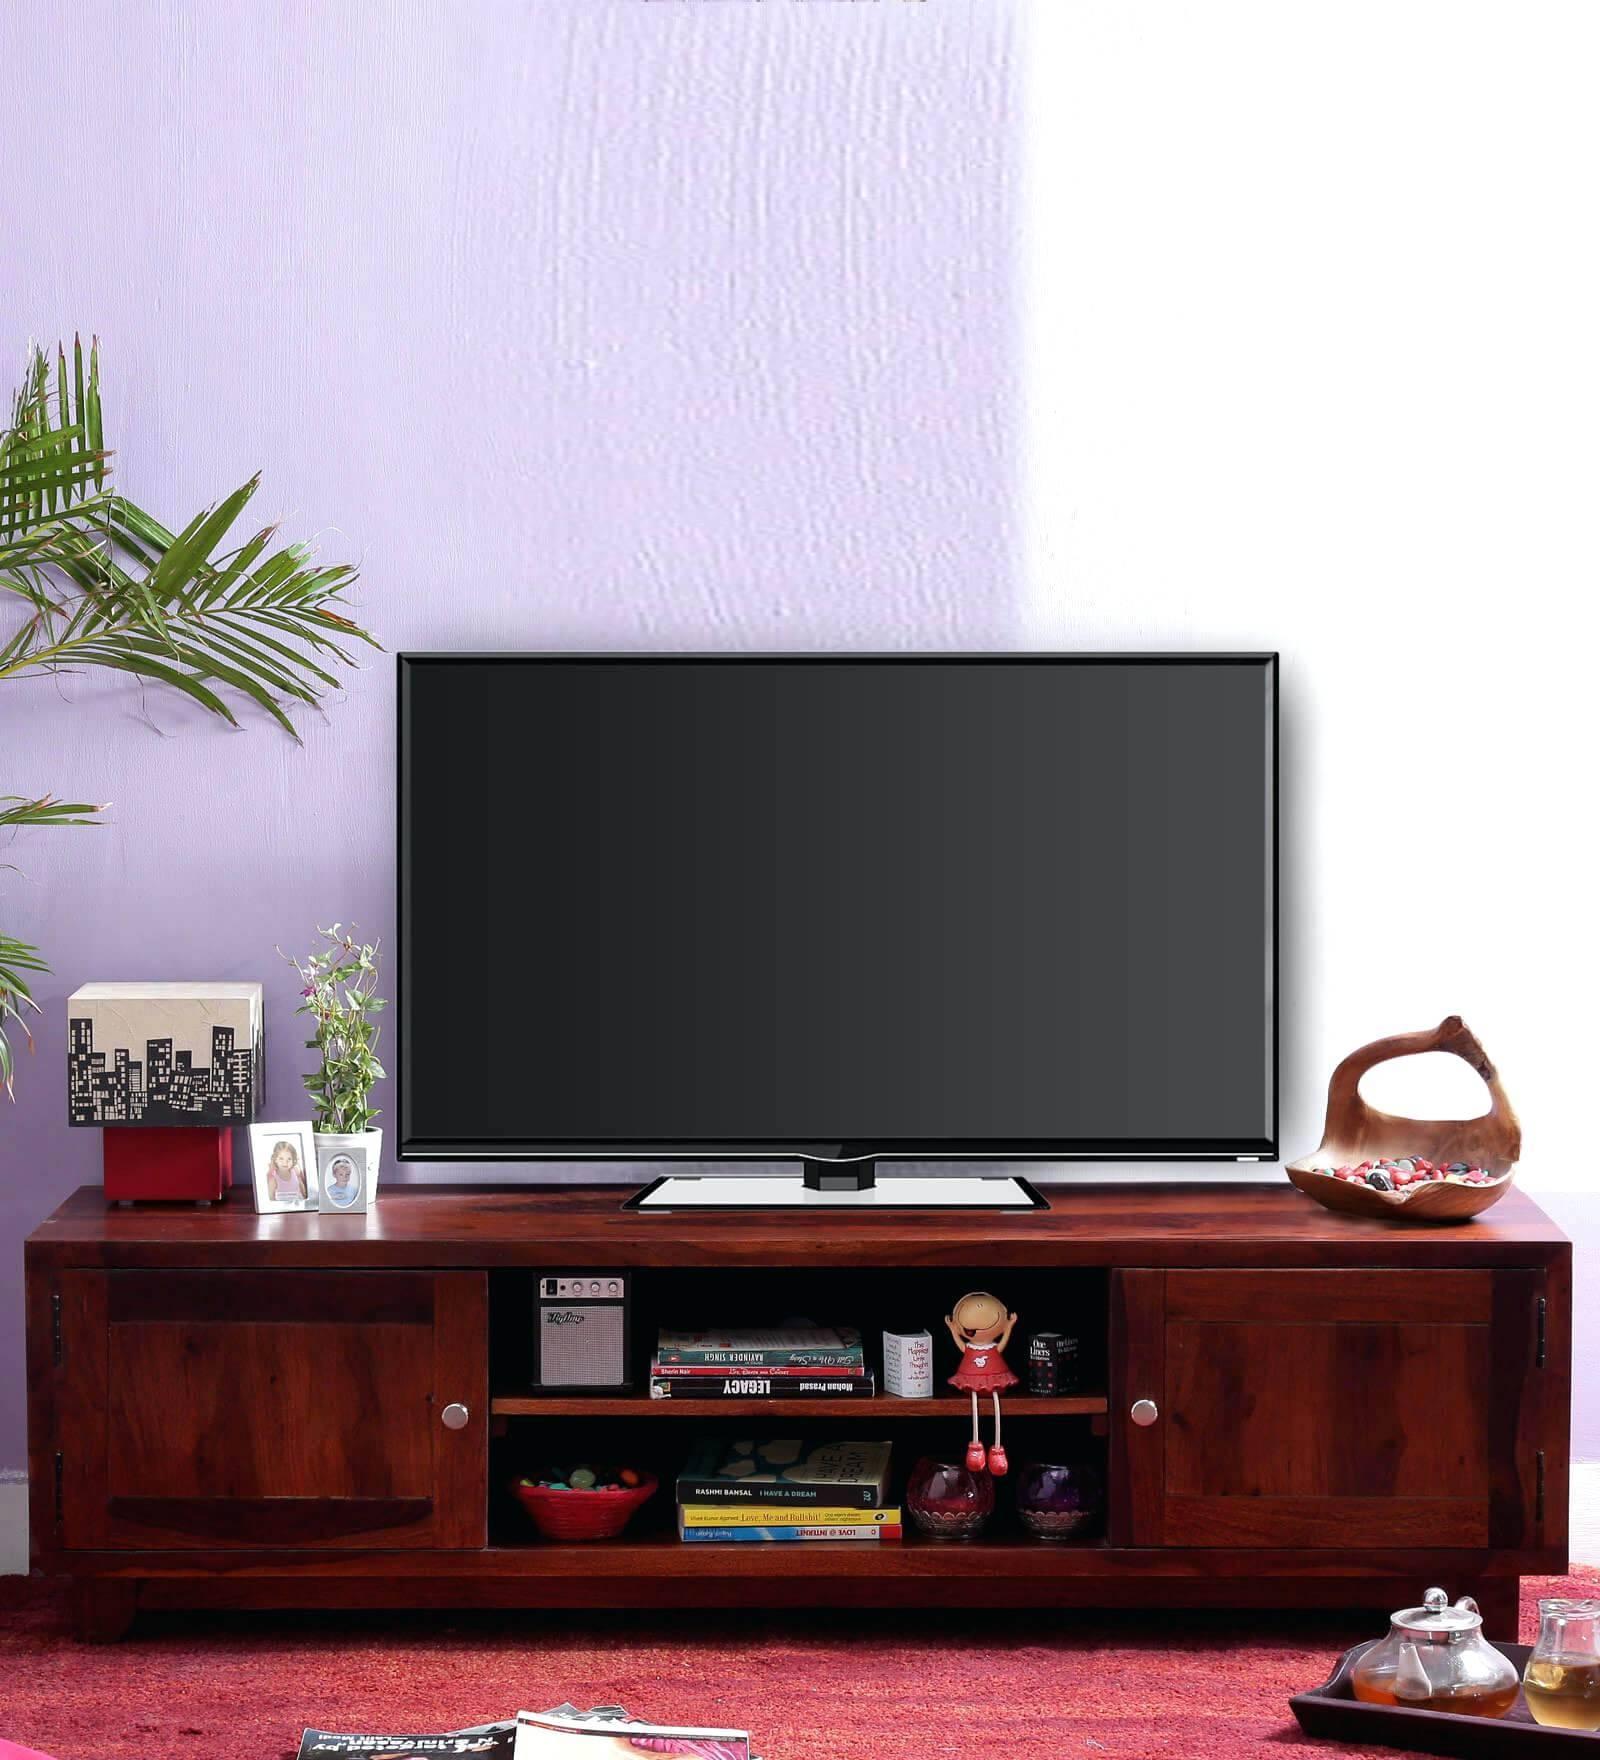 Tv Stand : Furniture Design 60 Cozy Dark Oak Tv Unit Sj027 Dark pertaining to Honey Oak Tv Stands (Image 11 of 15)